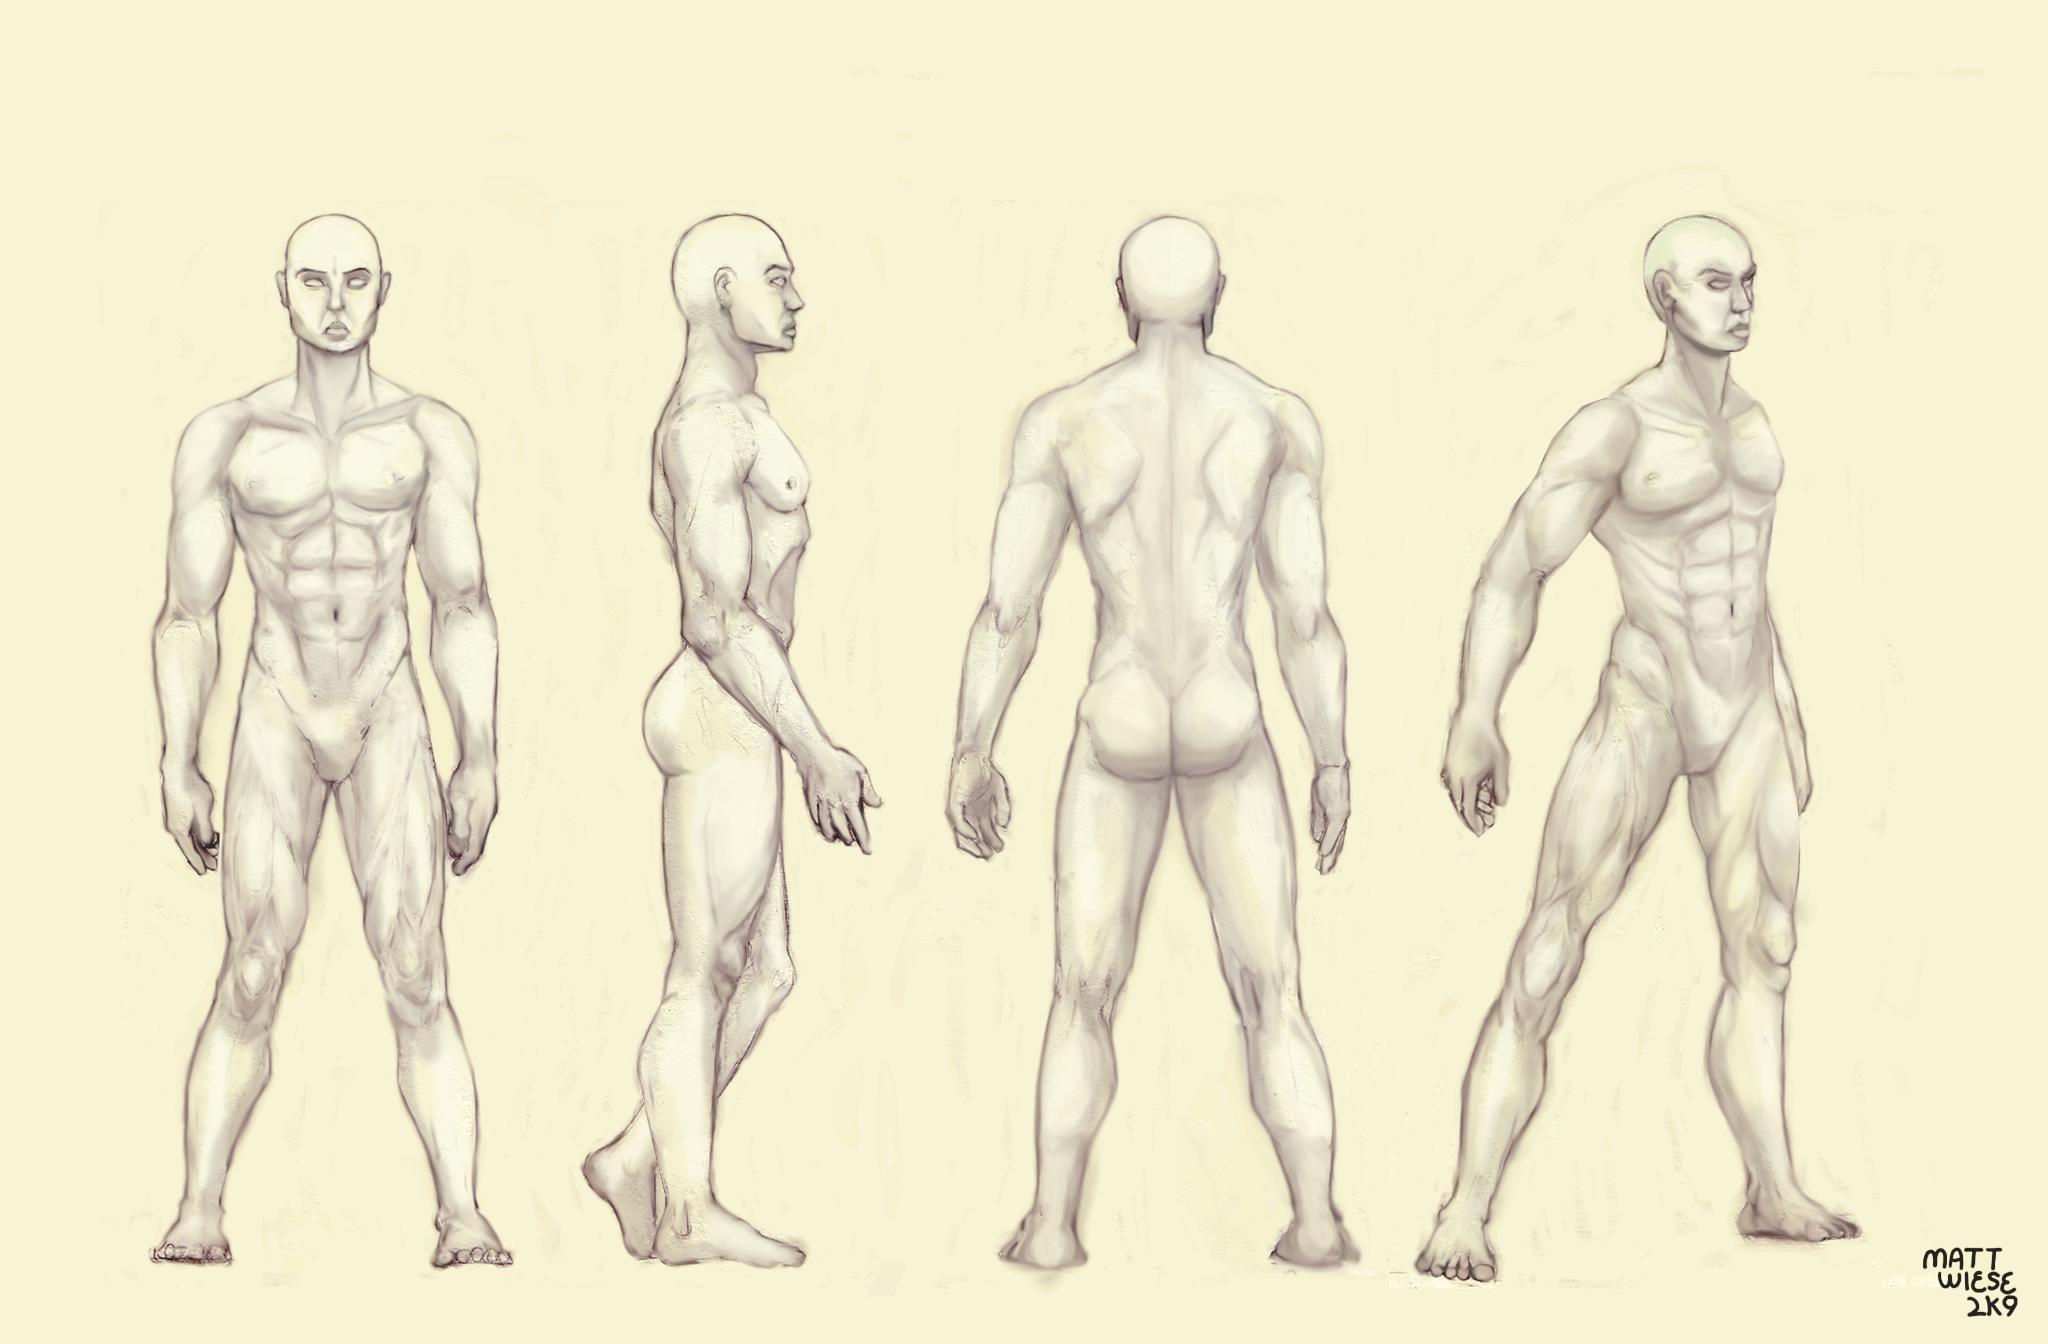 2048x1344 Male Figure Template Matthew Wiese Foundmyself